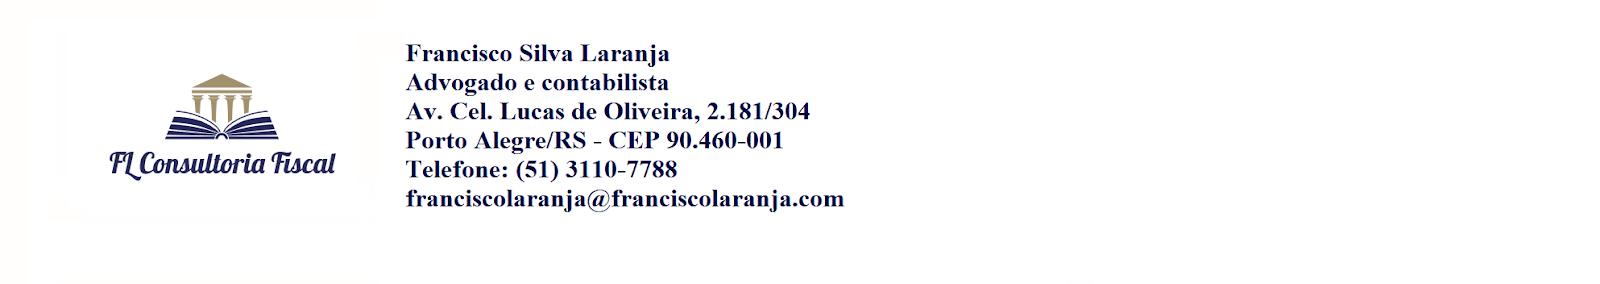 Francisco Laranja Consultoria Fiscal e Tributária